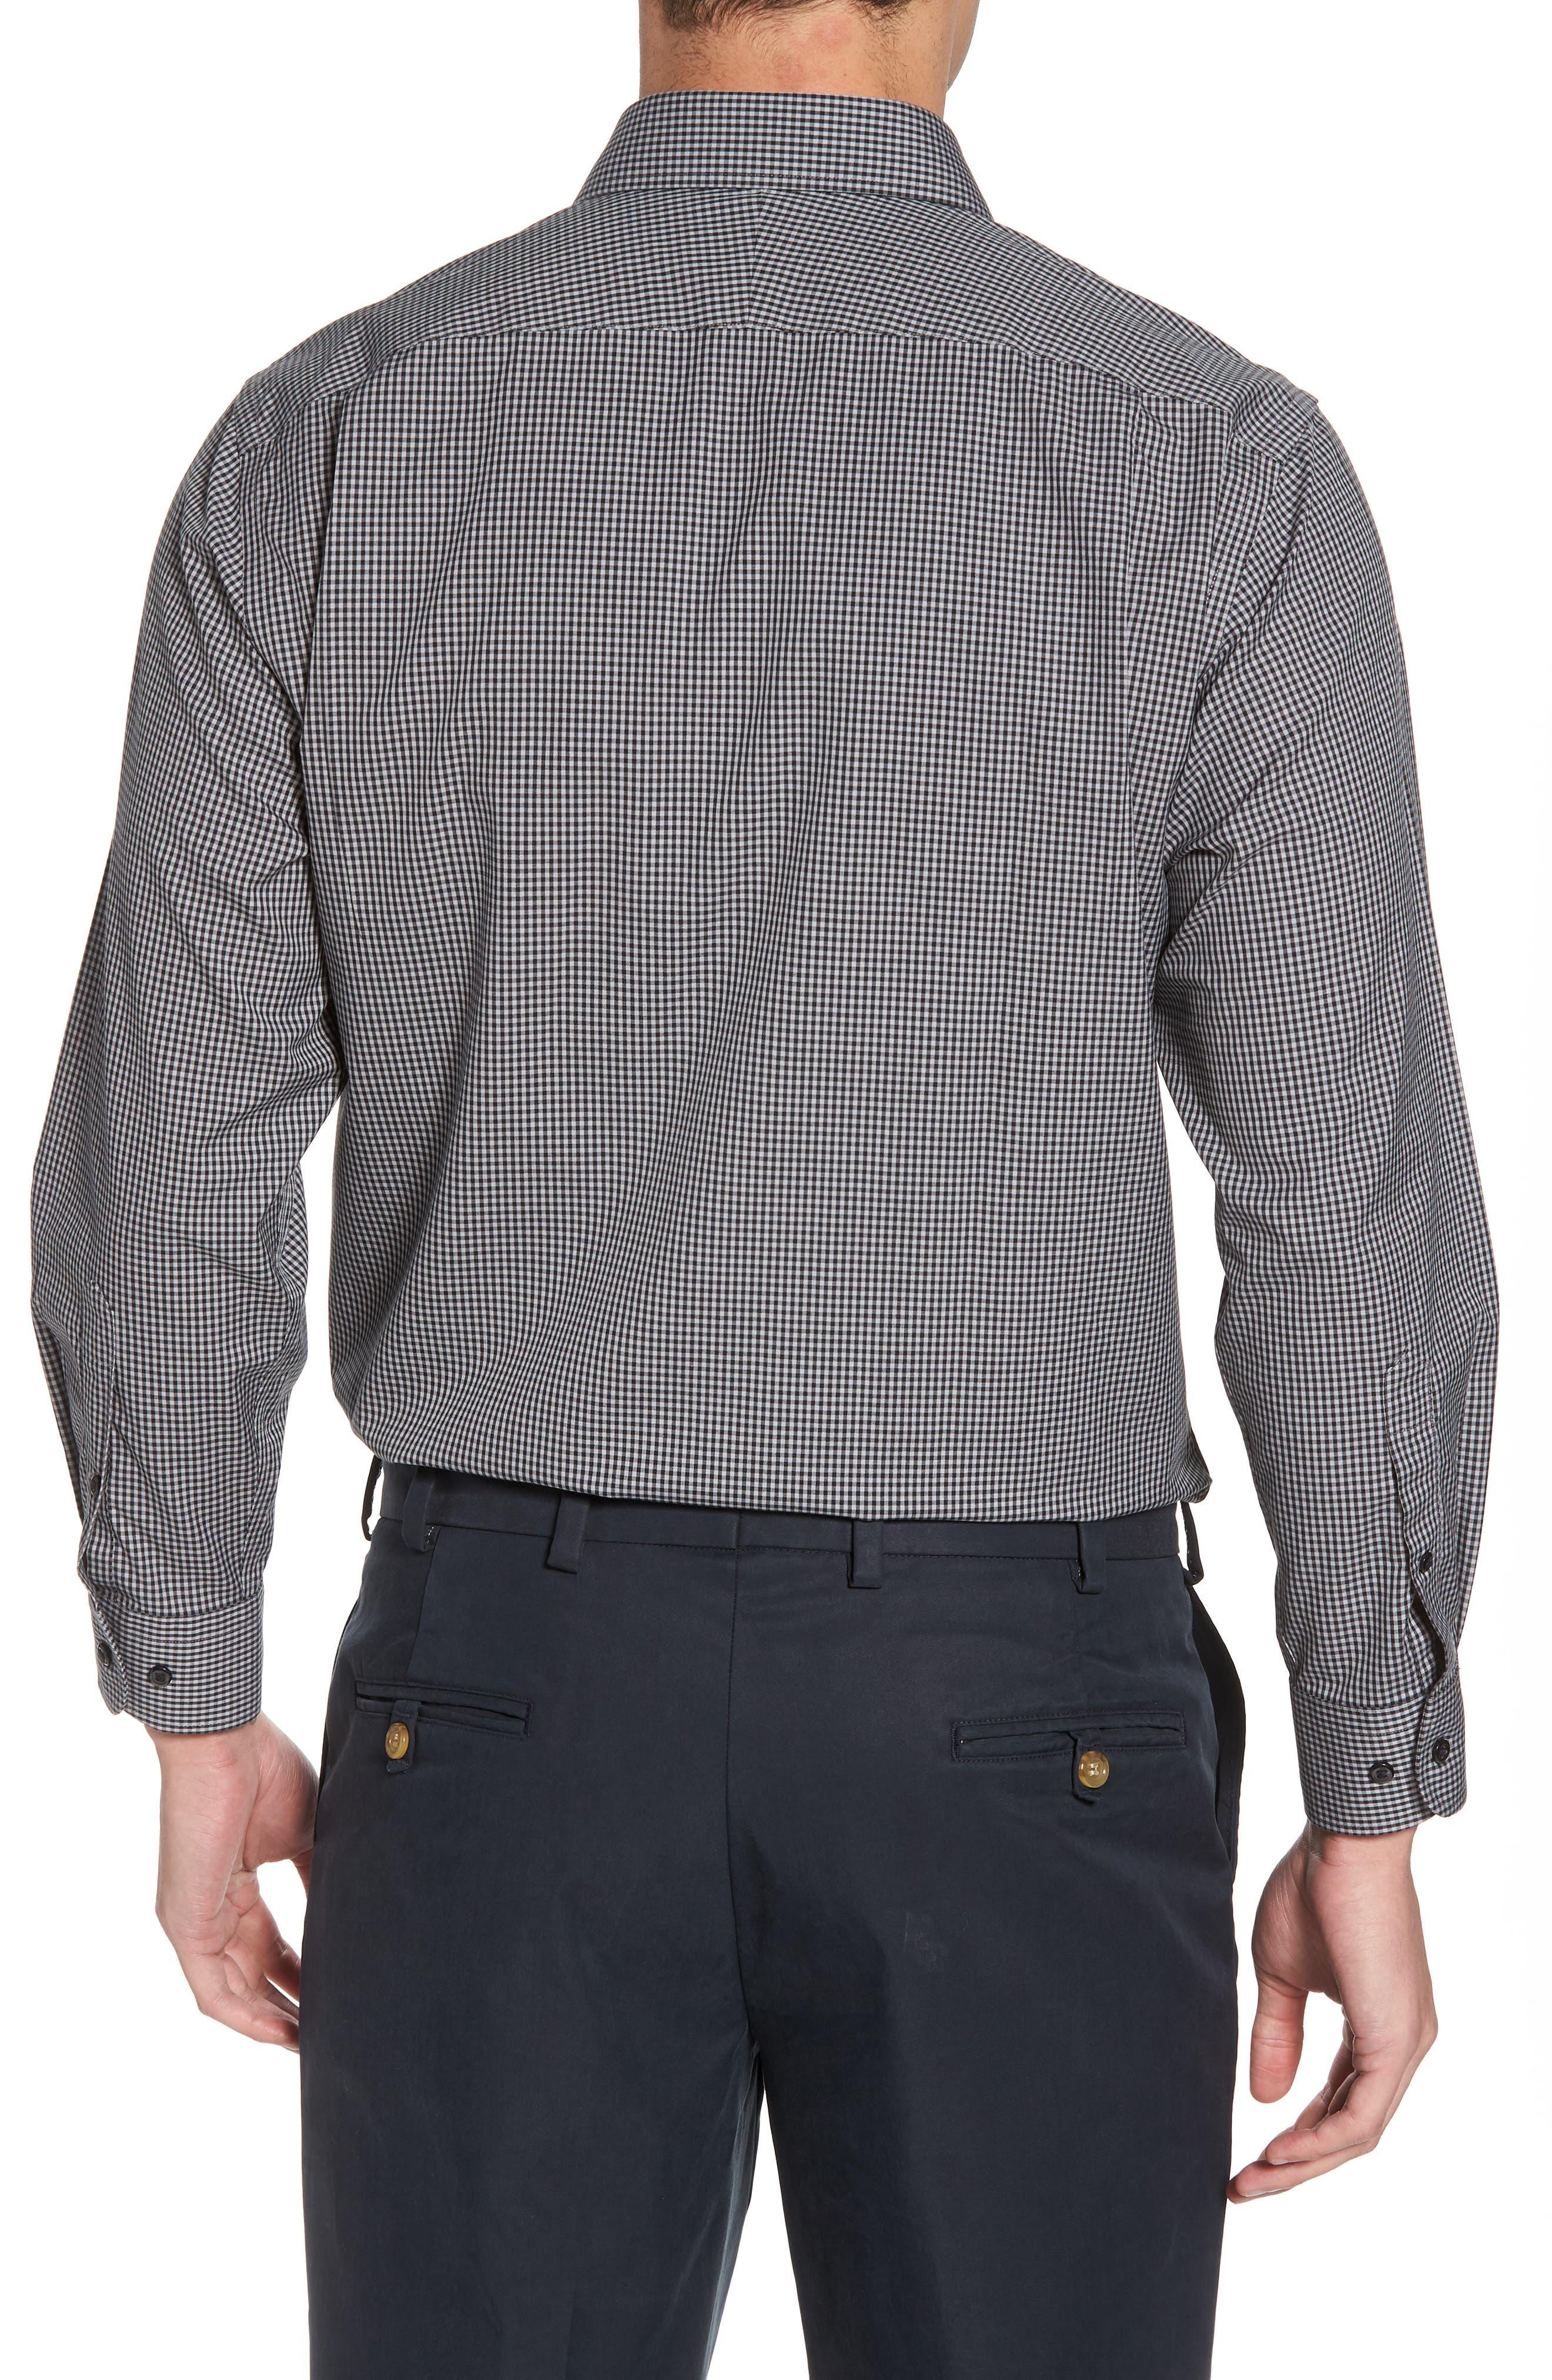 Smartcare<sup>™</sup> Traditional Fit Check Dress Shirt,                             Alternate thumbnail 3, color,                             Black Rock